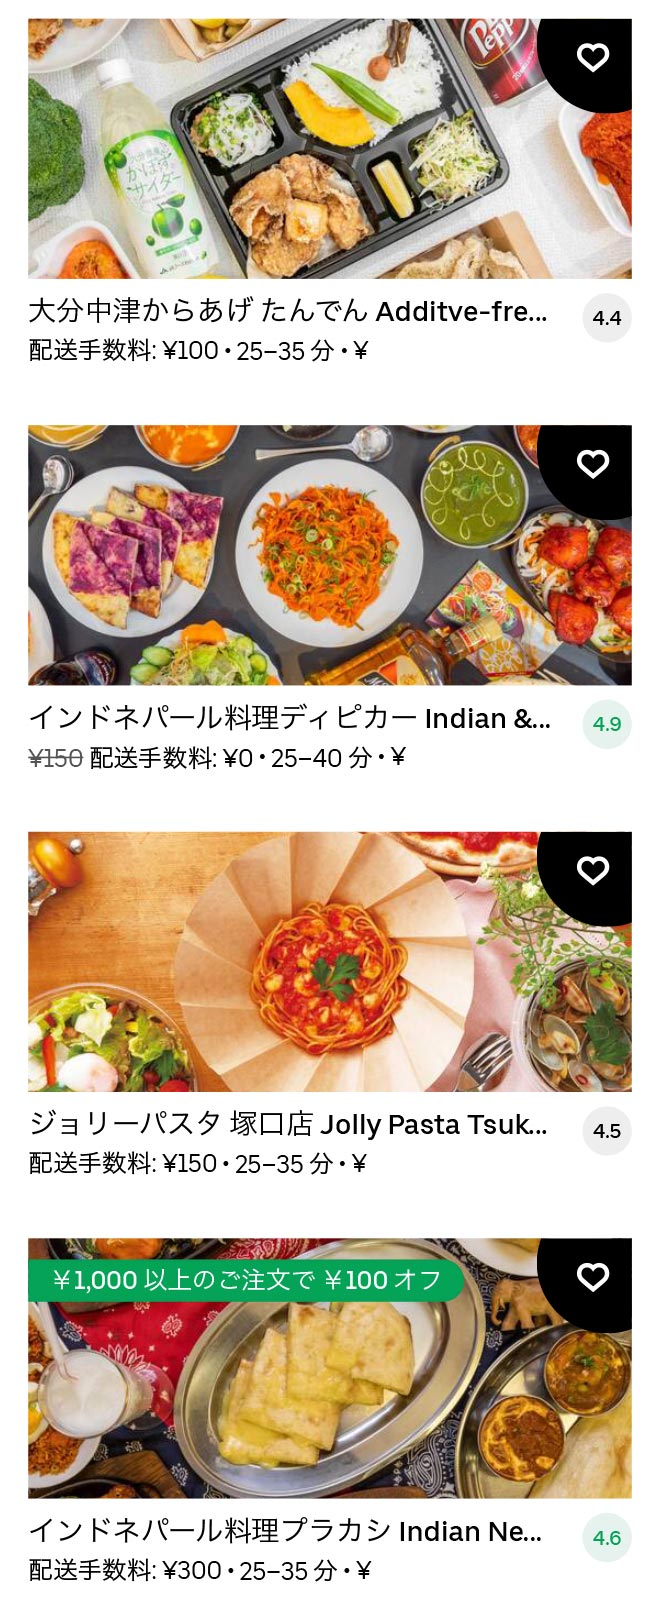 Hankyu itami menu 2011 09